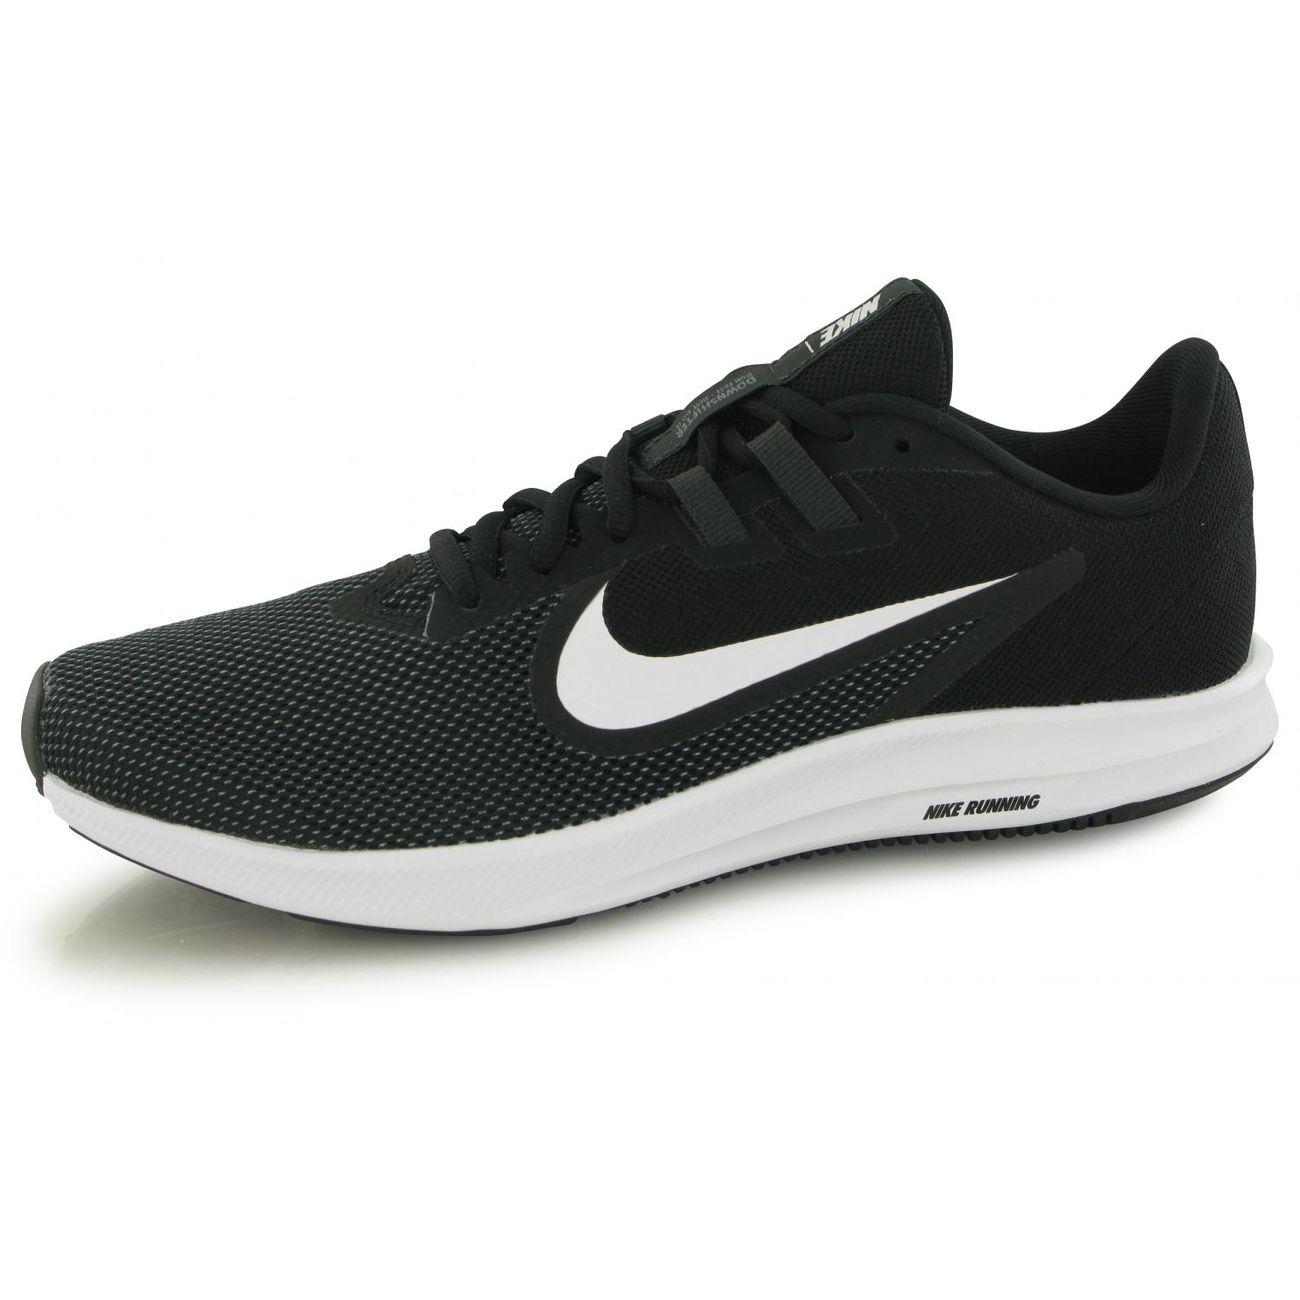 Running Homme Running Nike Chaussures Chaussures Running Downshifter Nike Homme Downshifter Homme qzUMSVp